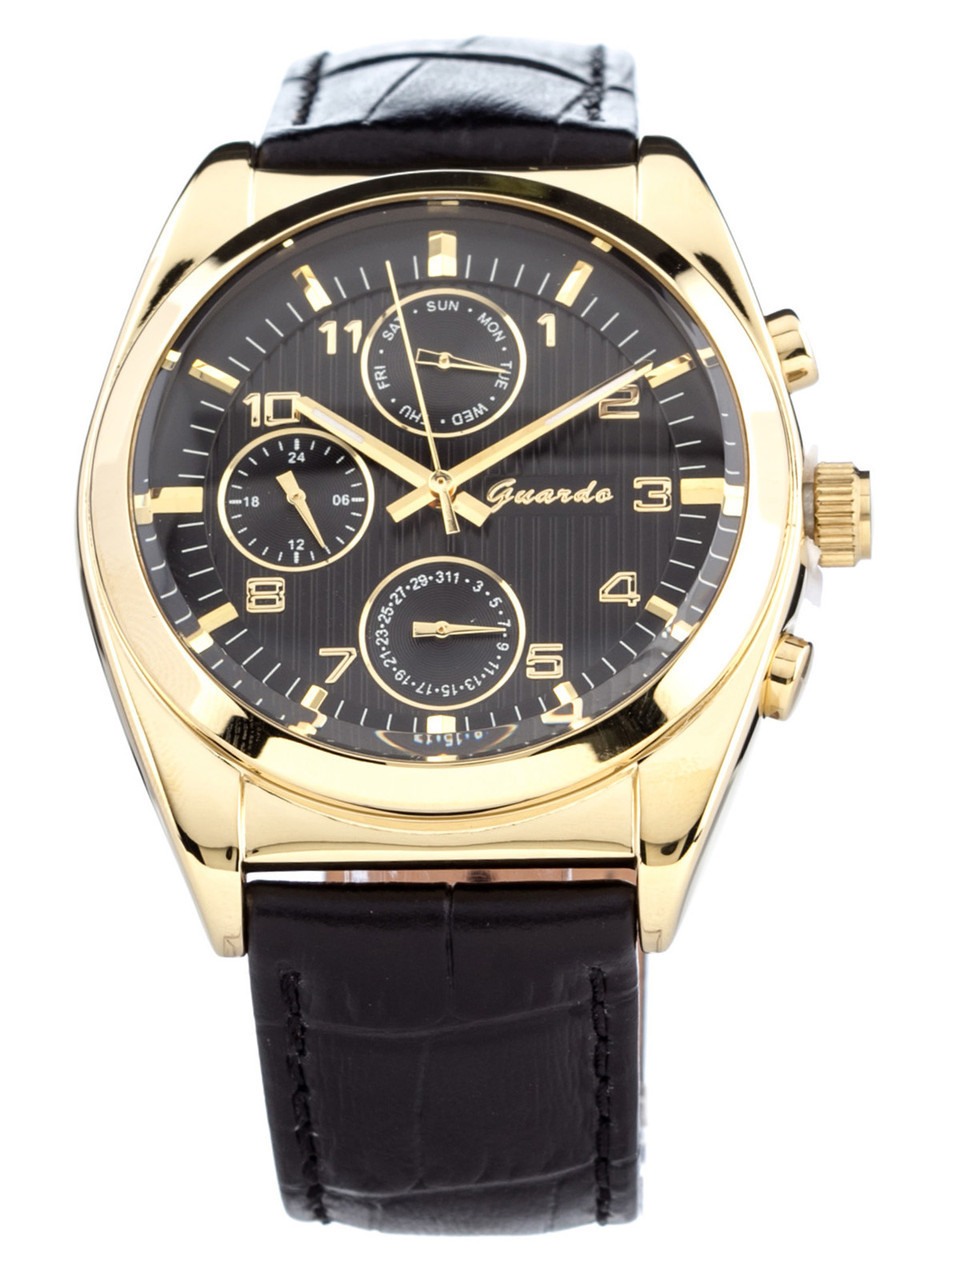 Мужские наручные часы Guardo S00749 GBB